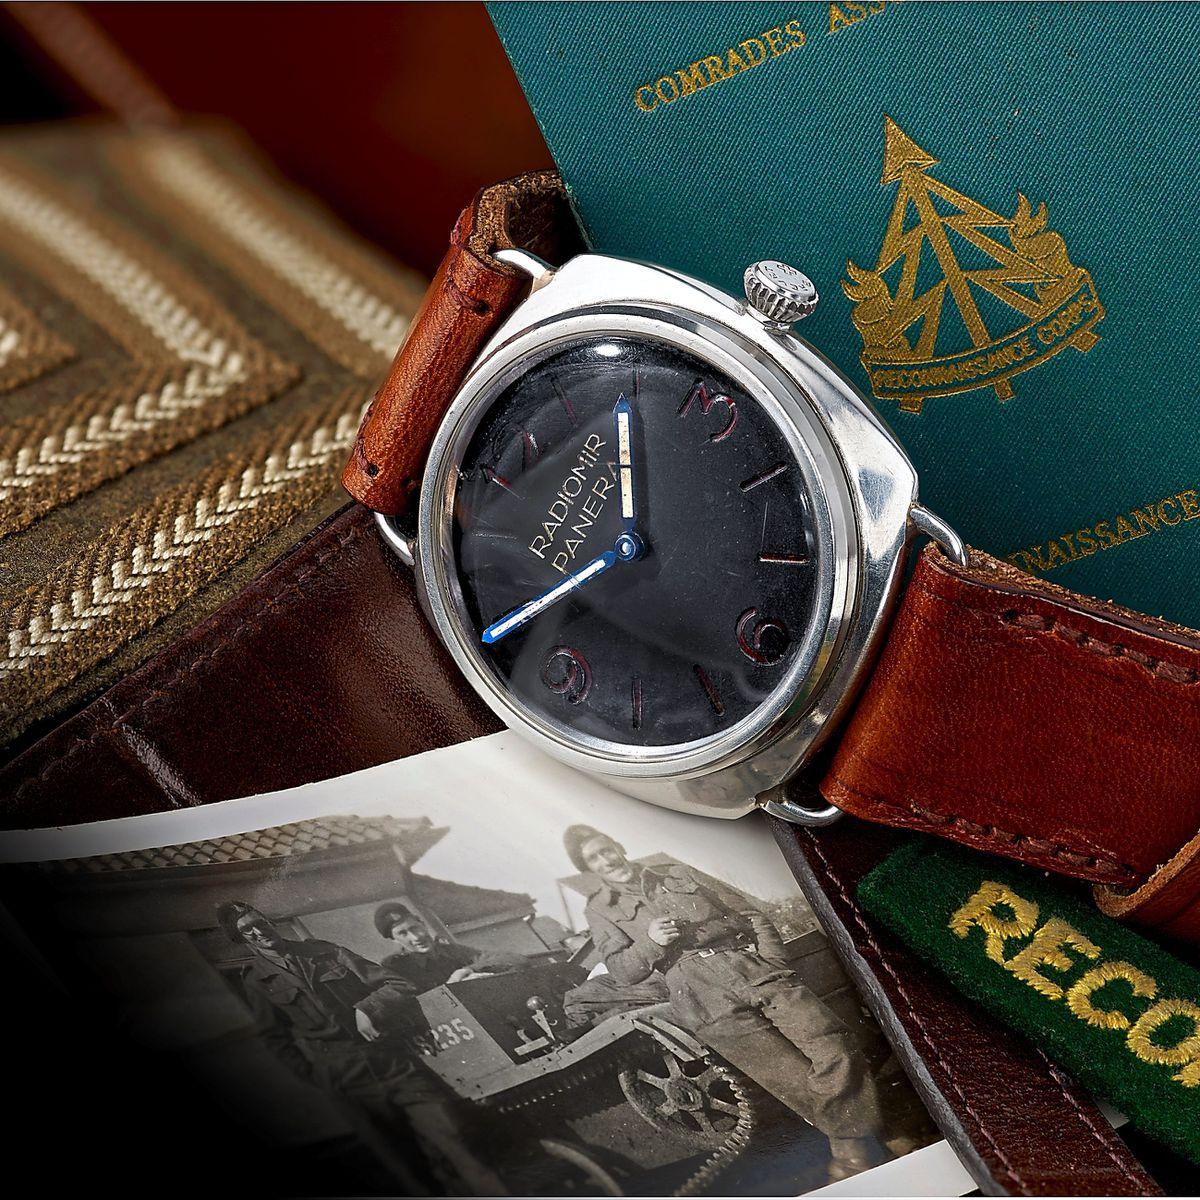 The Rolex Panerai Military Diver watch